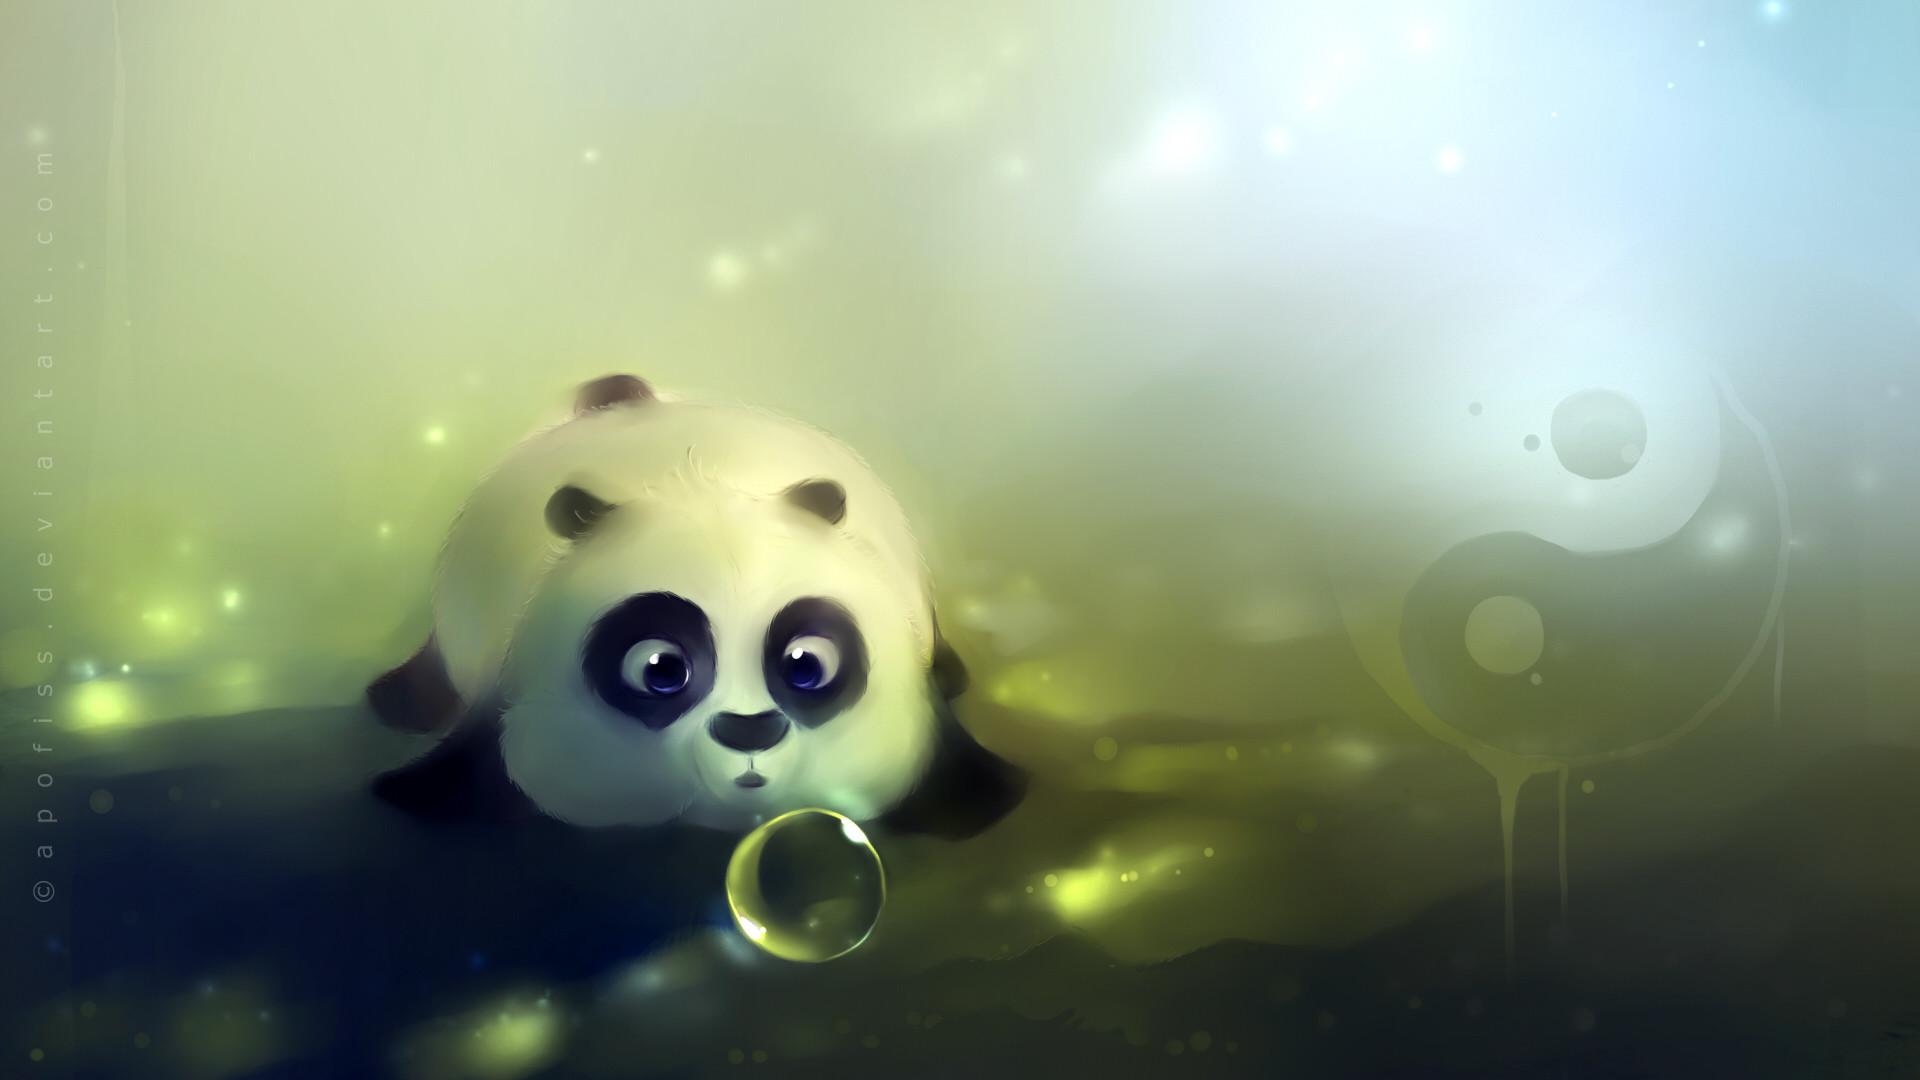 hinh gau truc panda 12